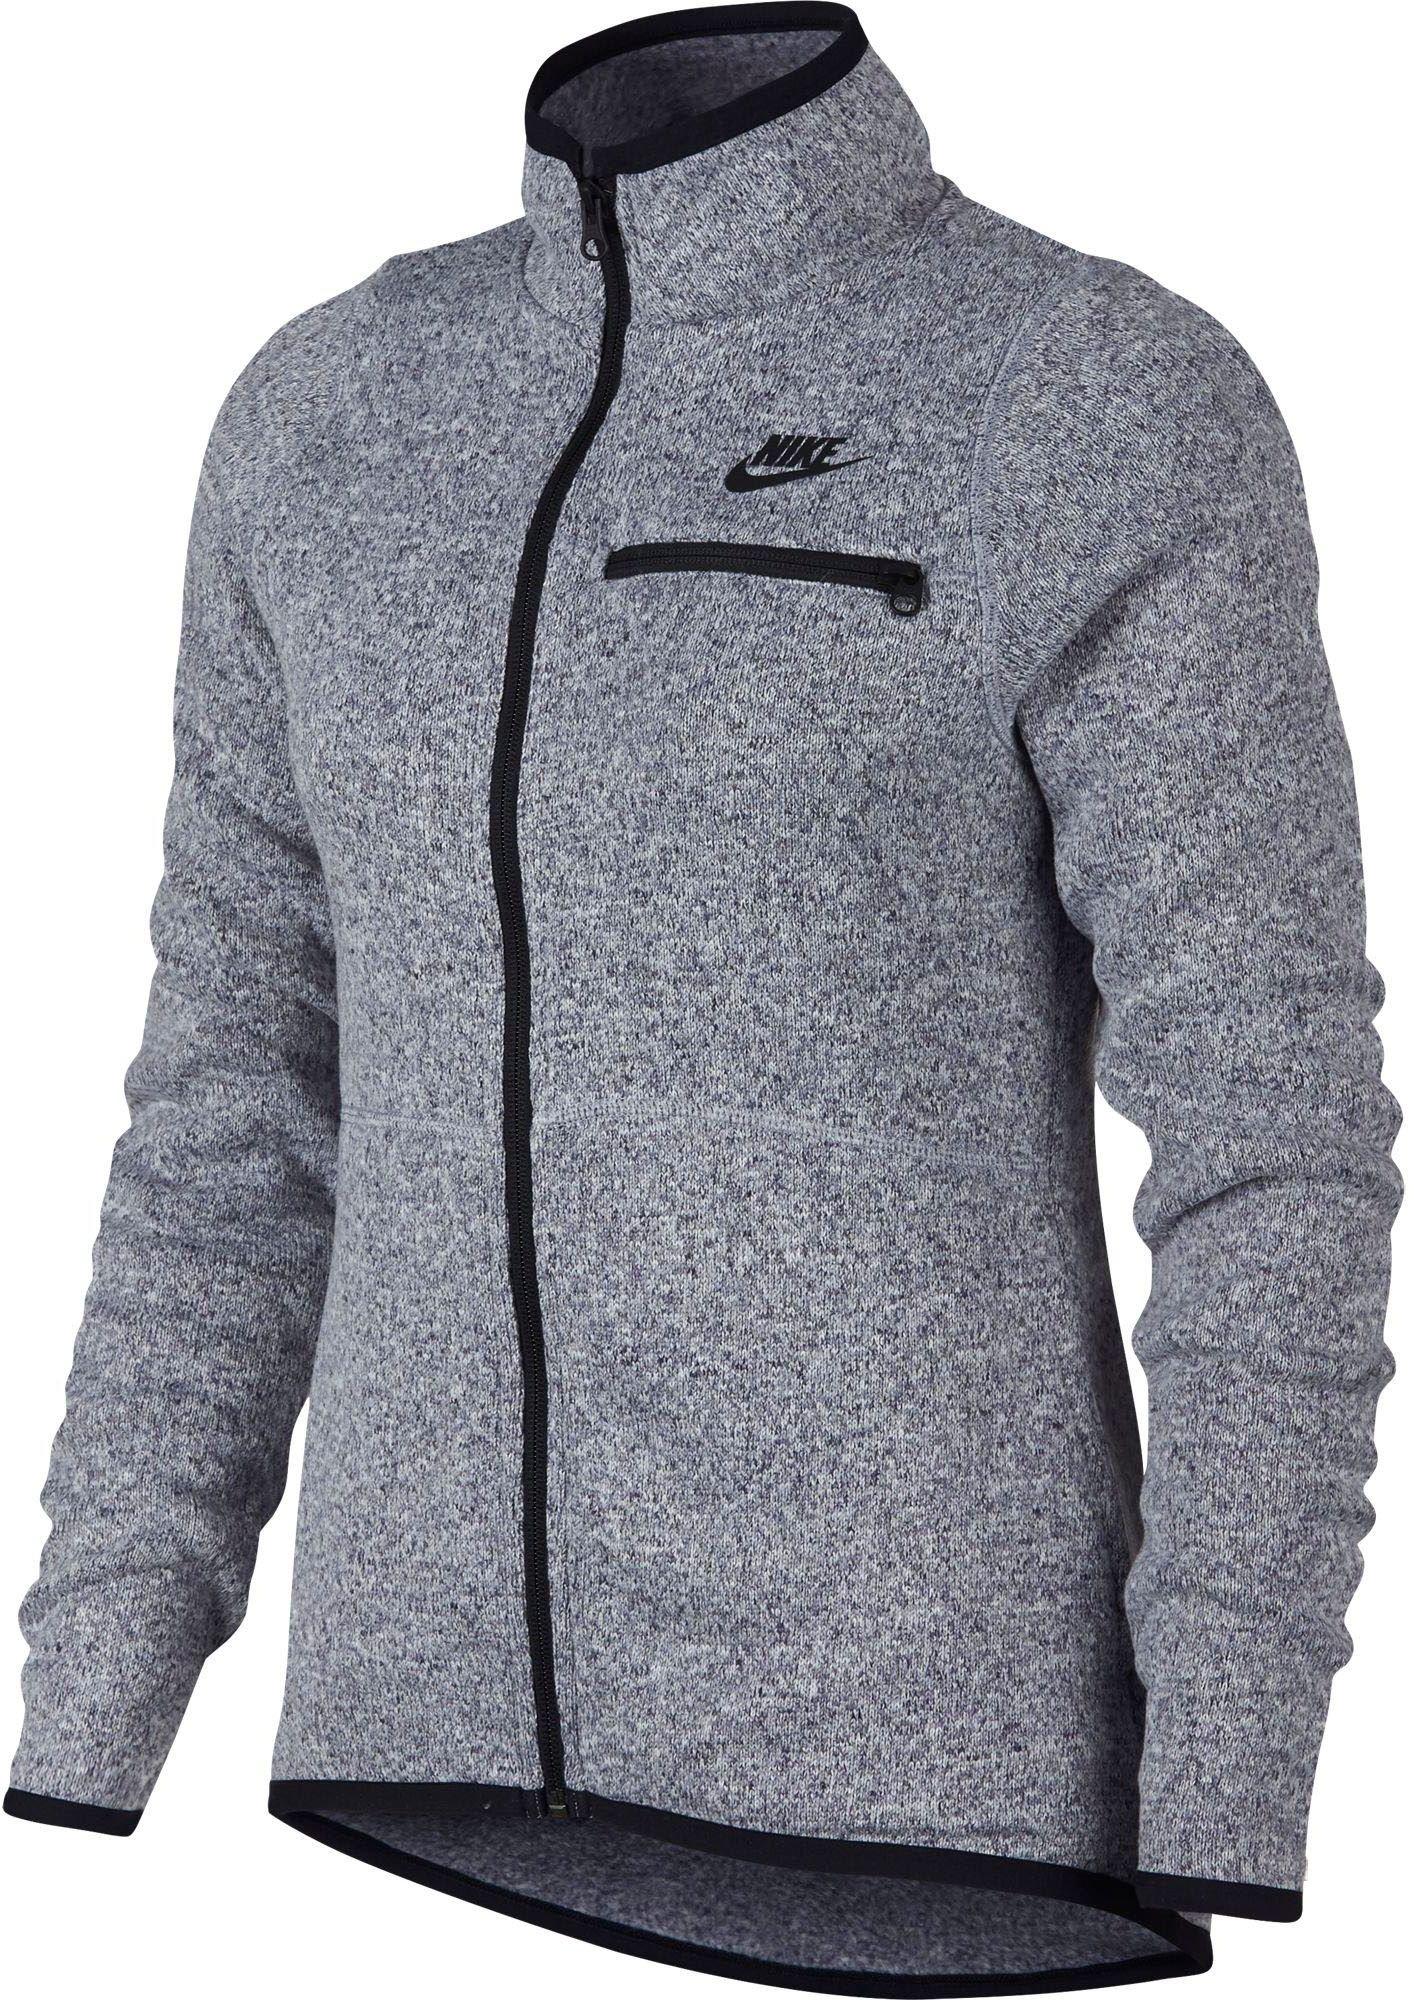 Nike Women's Sportswear Summit Full Zip (Provence Purple/Black, L)